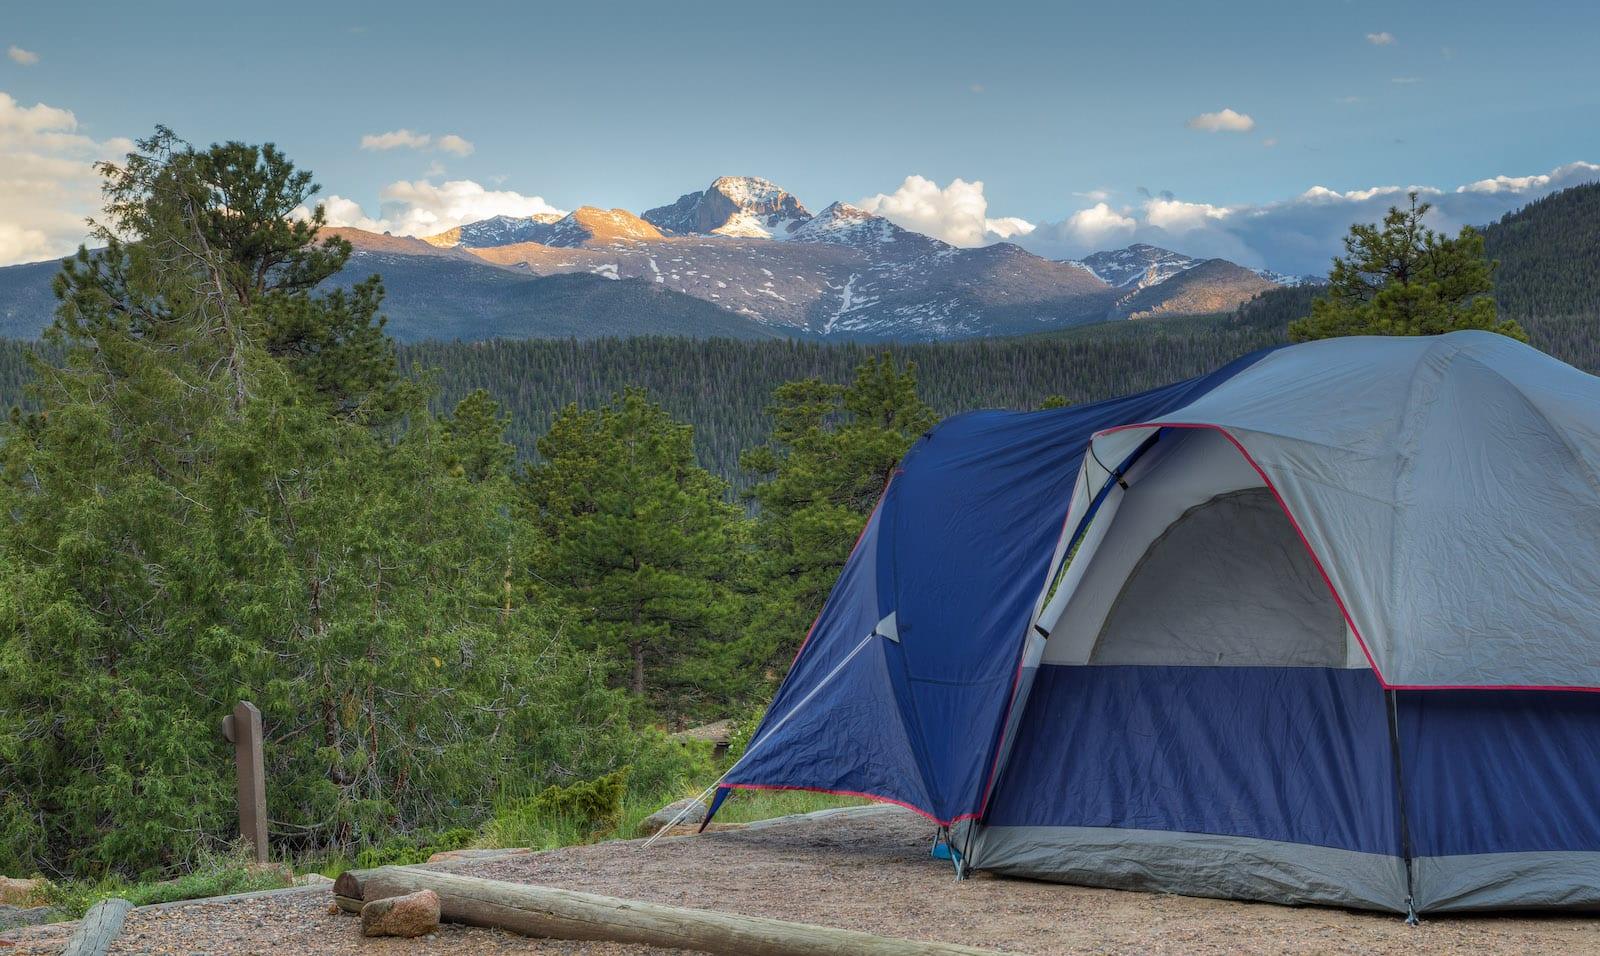 Camping Tent Rocky Mountain National Park Colorado